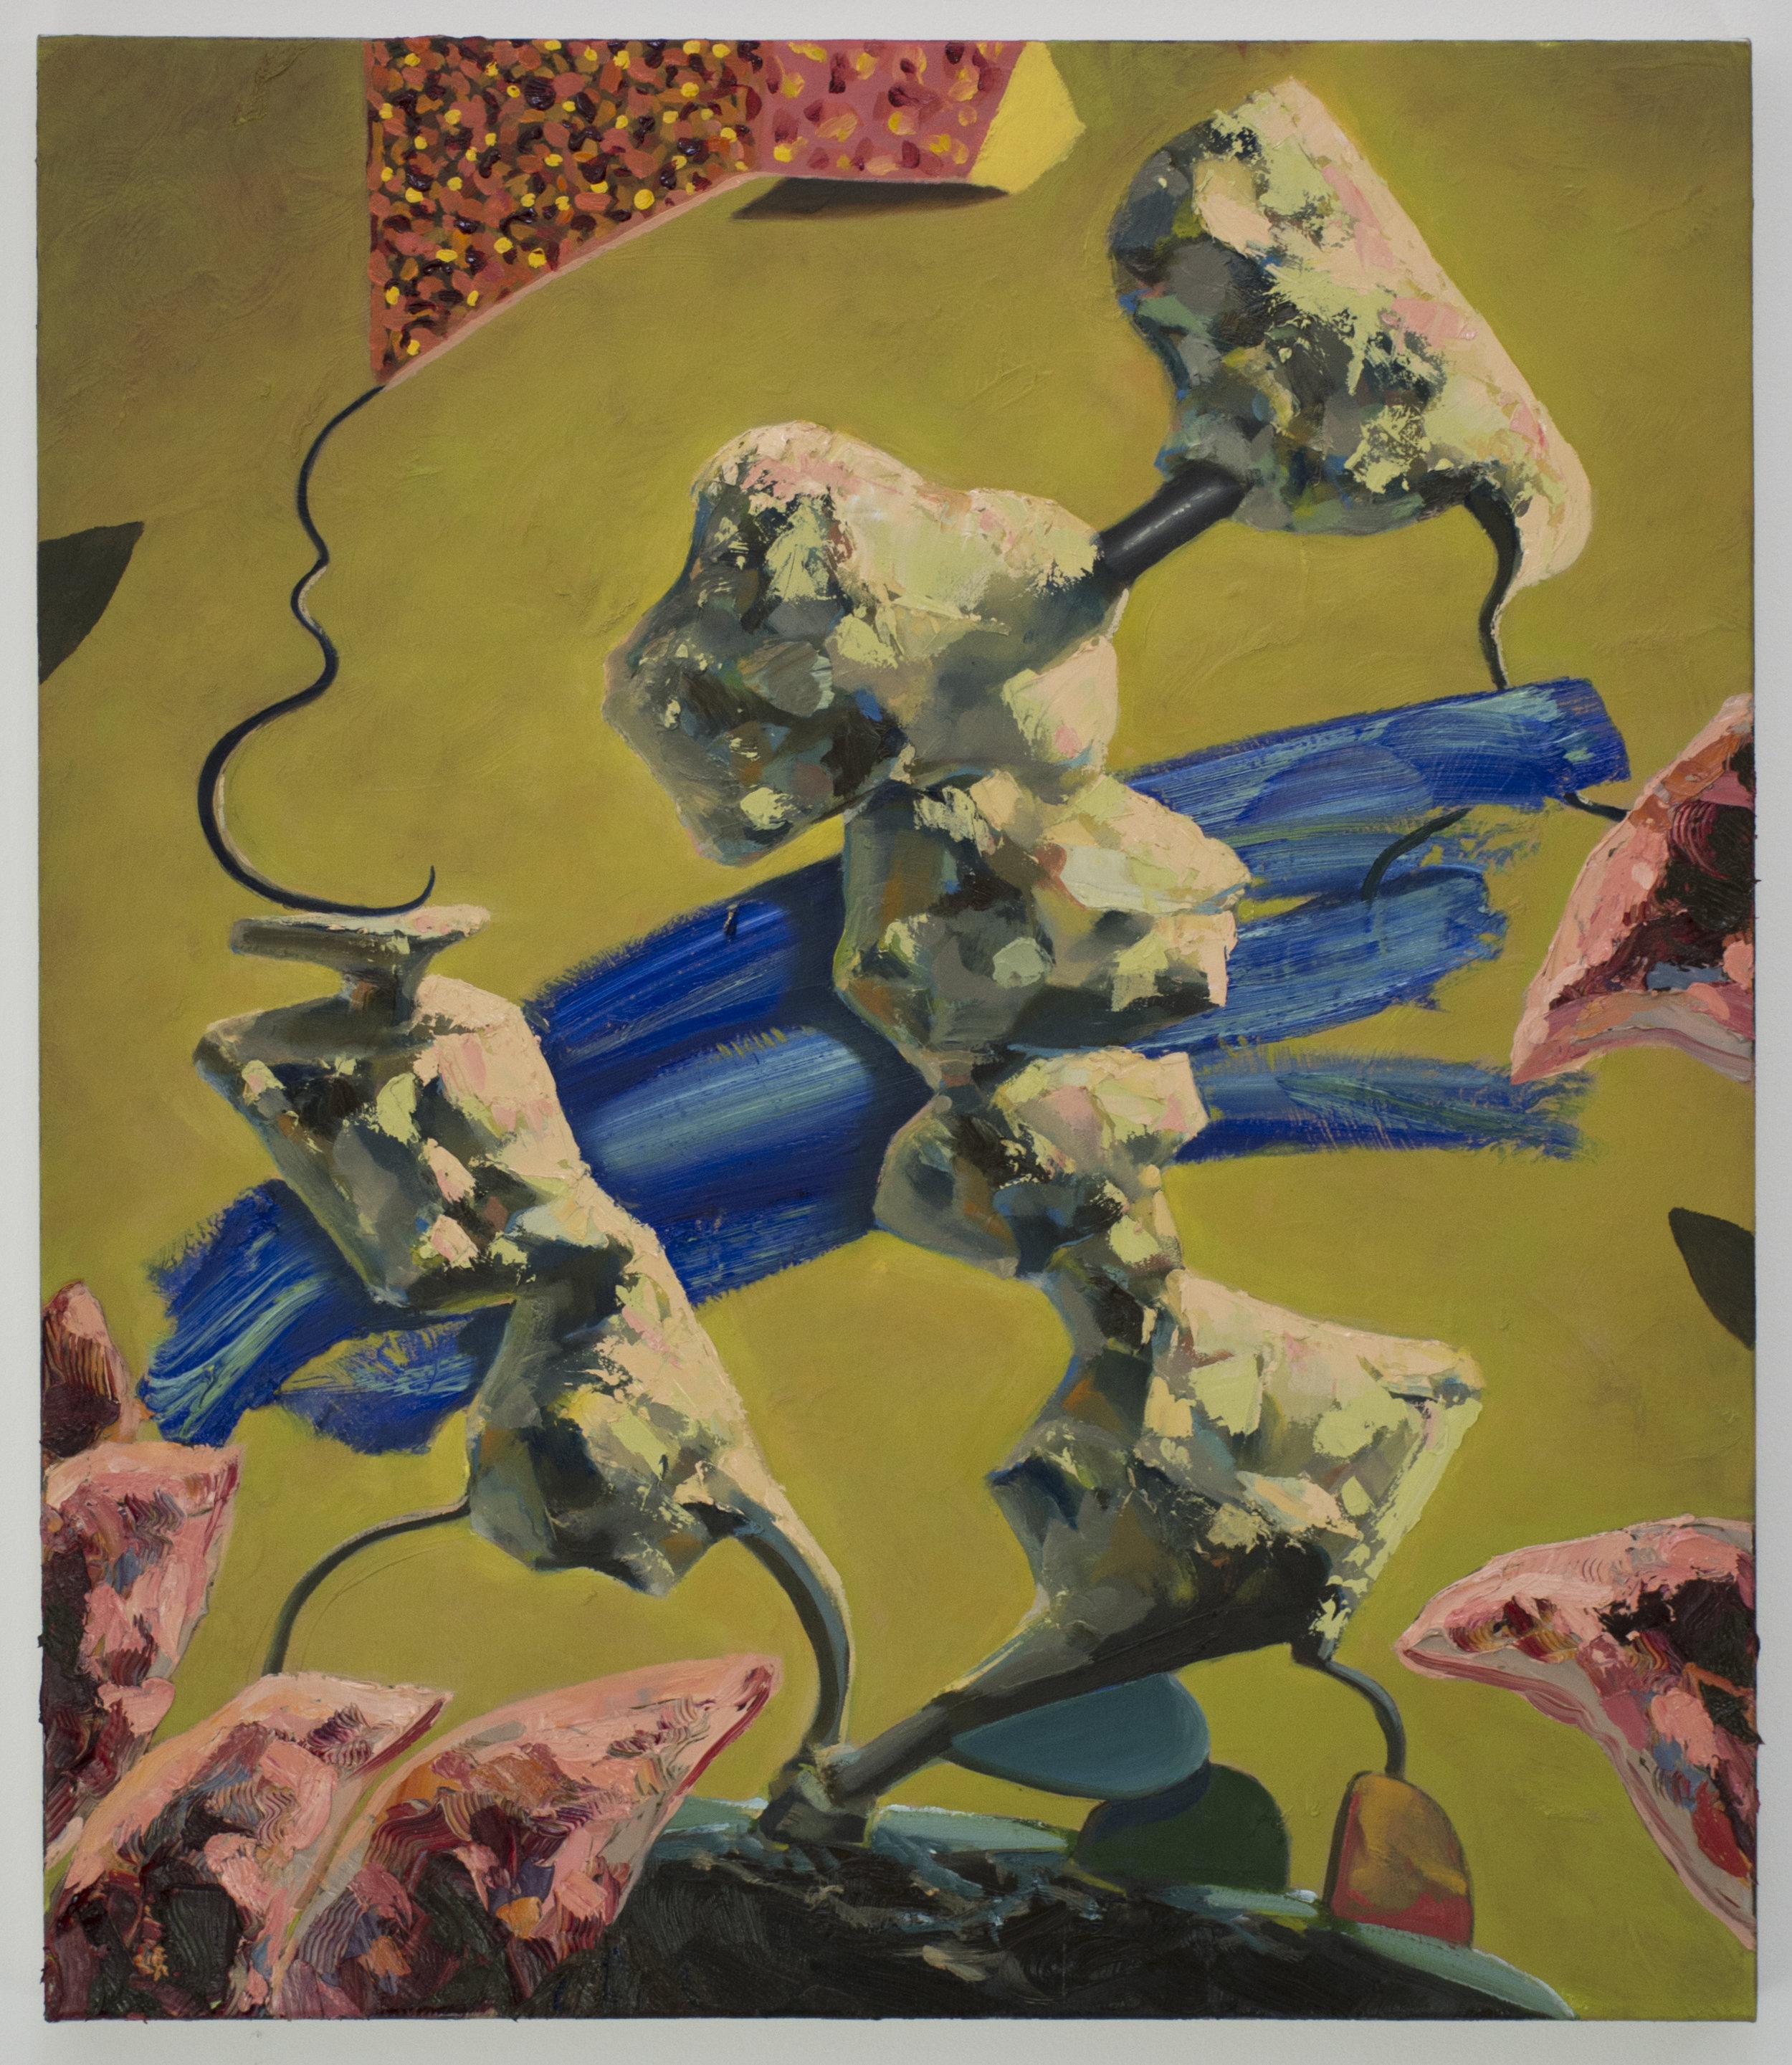 Study, 2018, Oil on linen, 70 x 60 cm